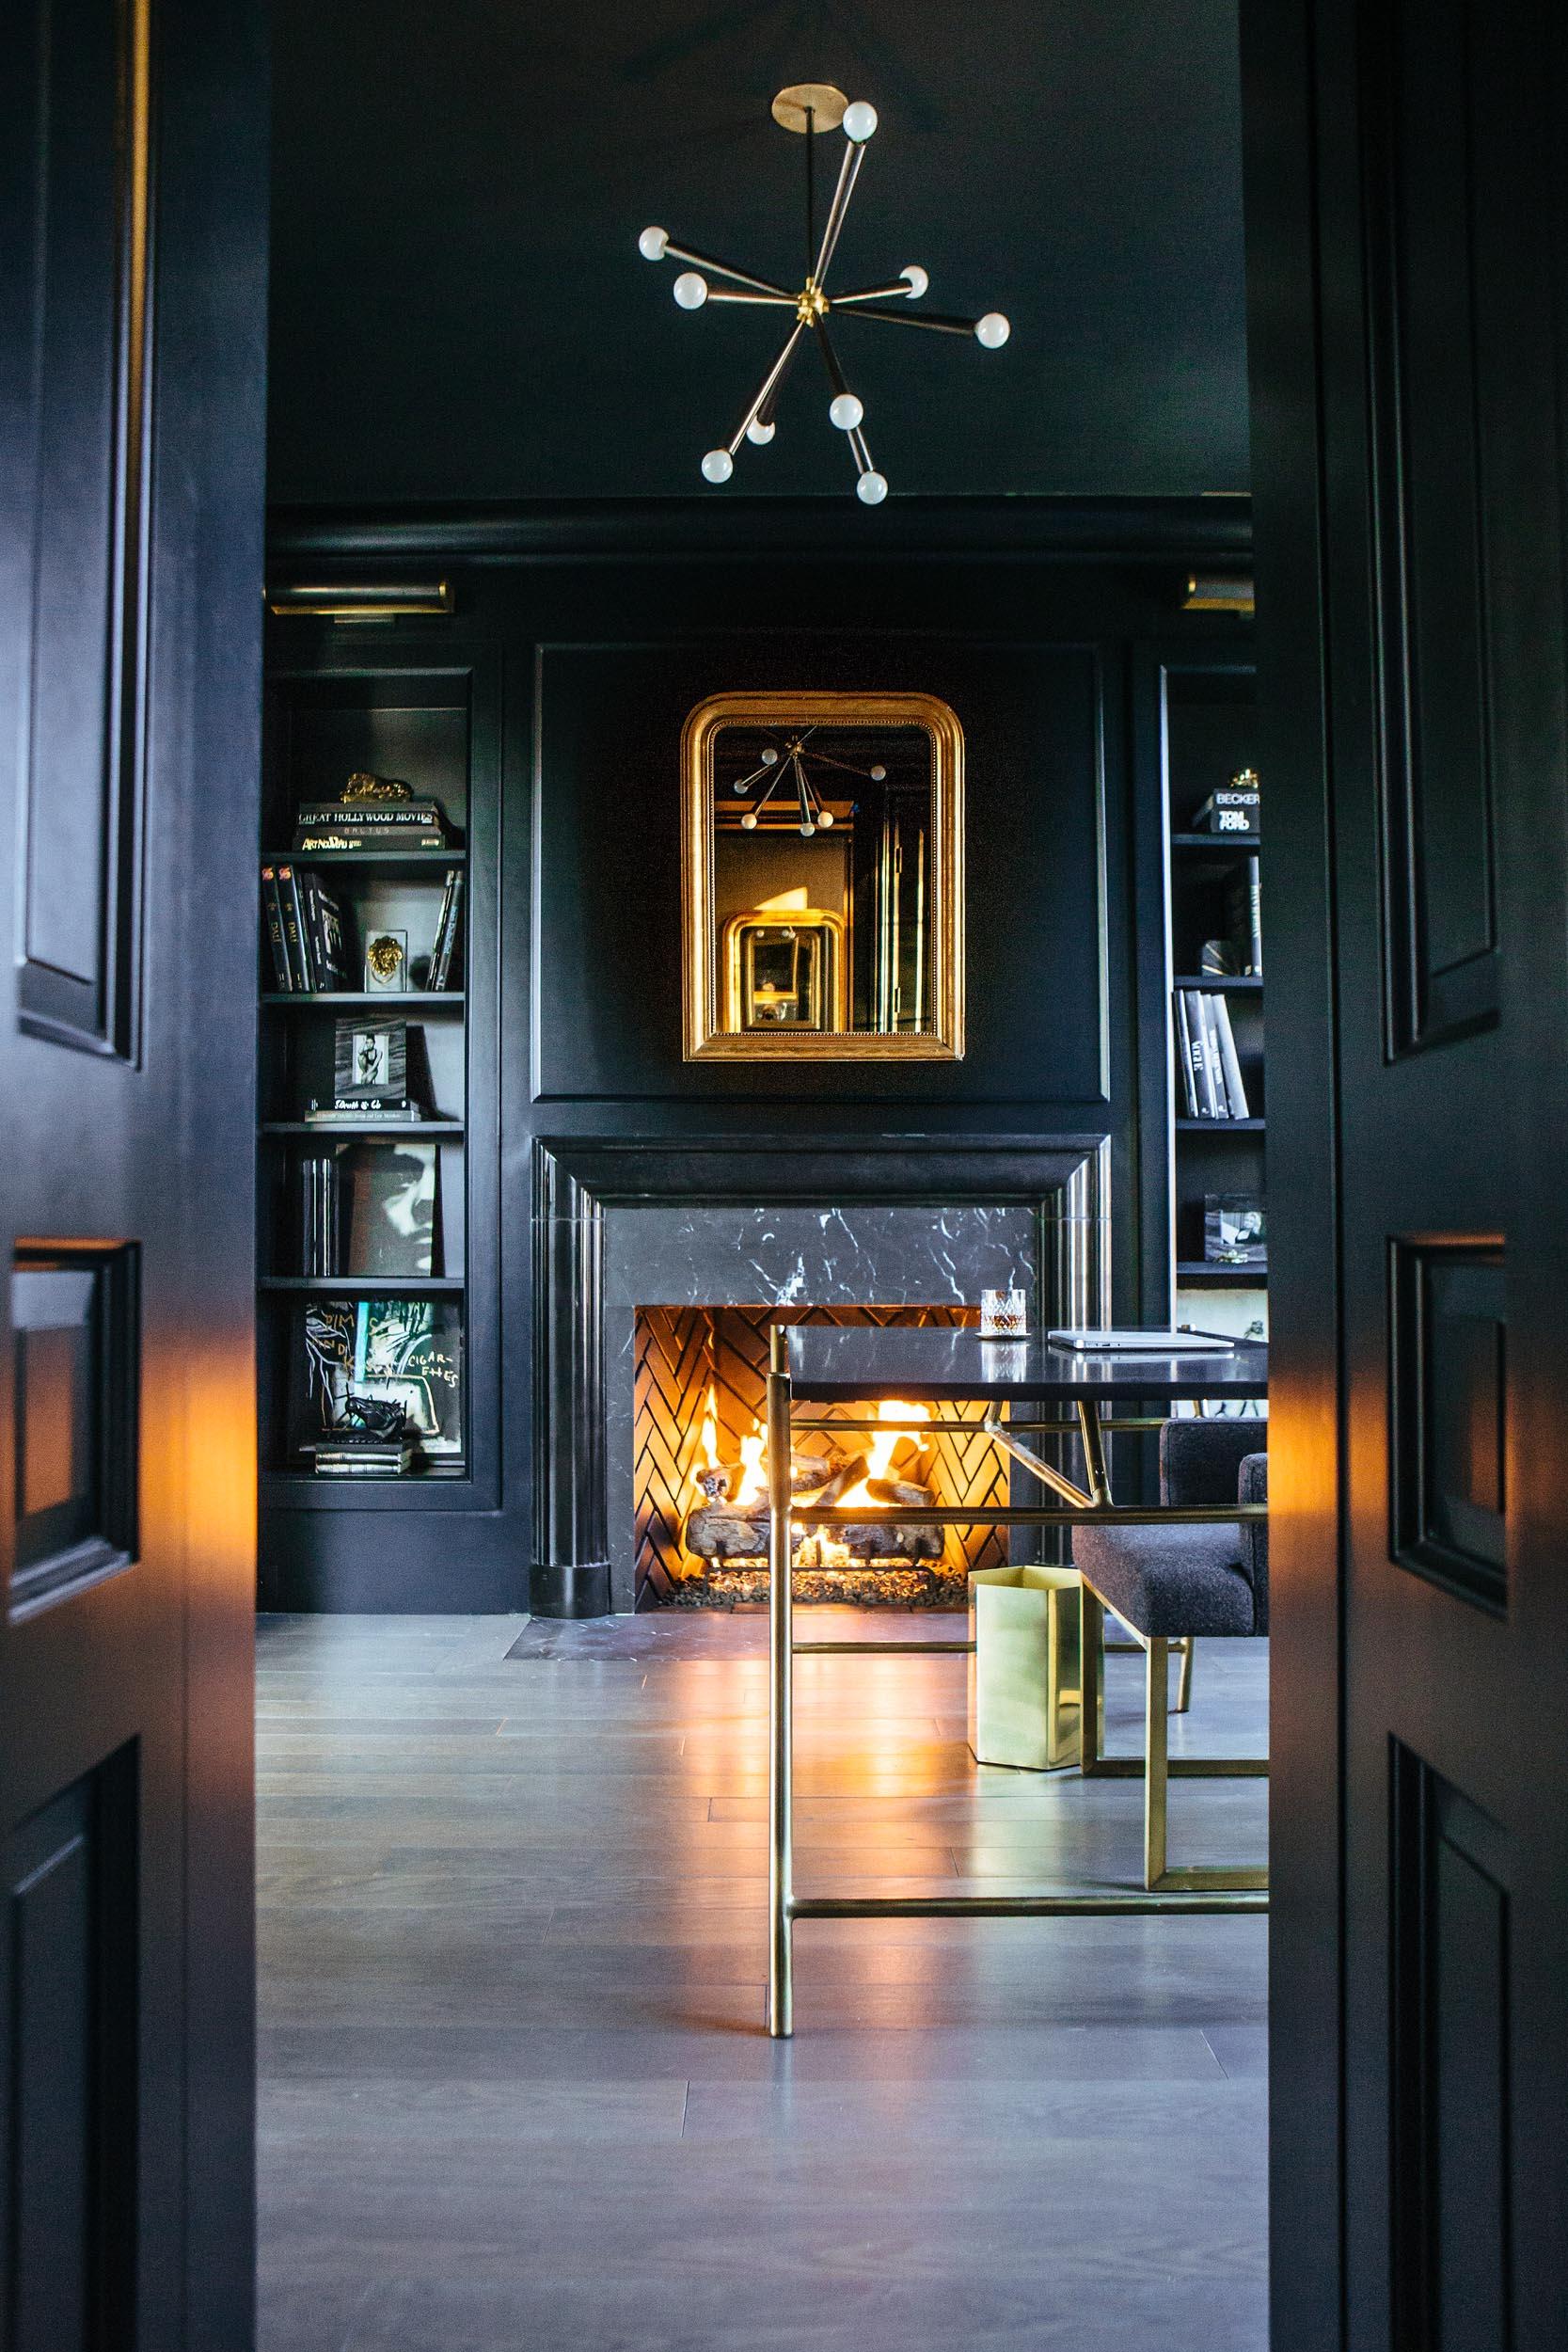 Leo_Designs_Chicago_interior_design_lincoln_park_parisian61.jpg